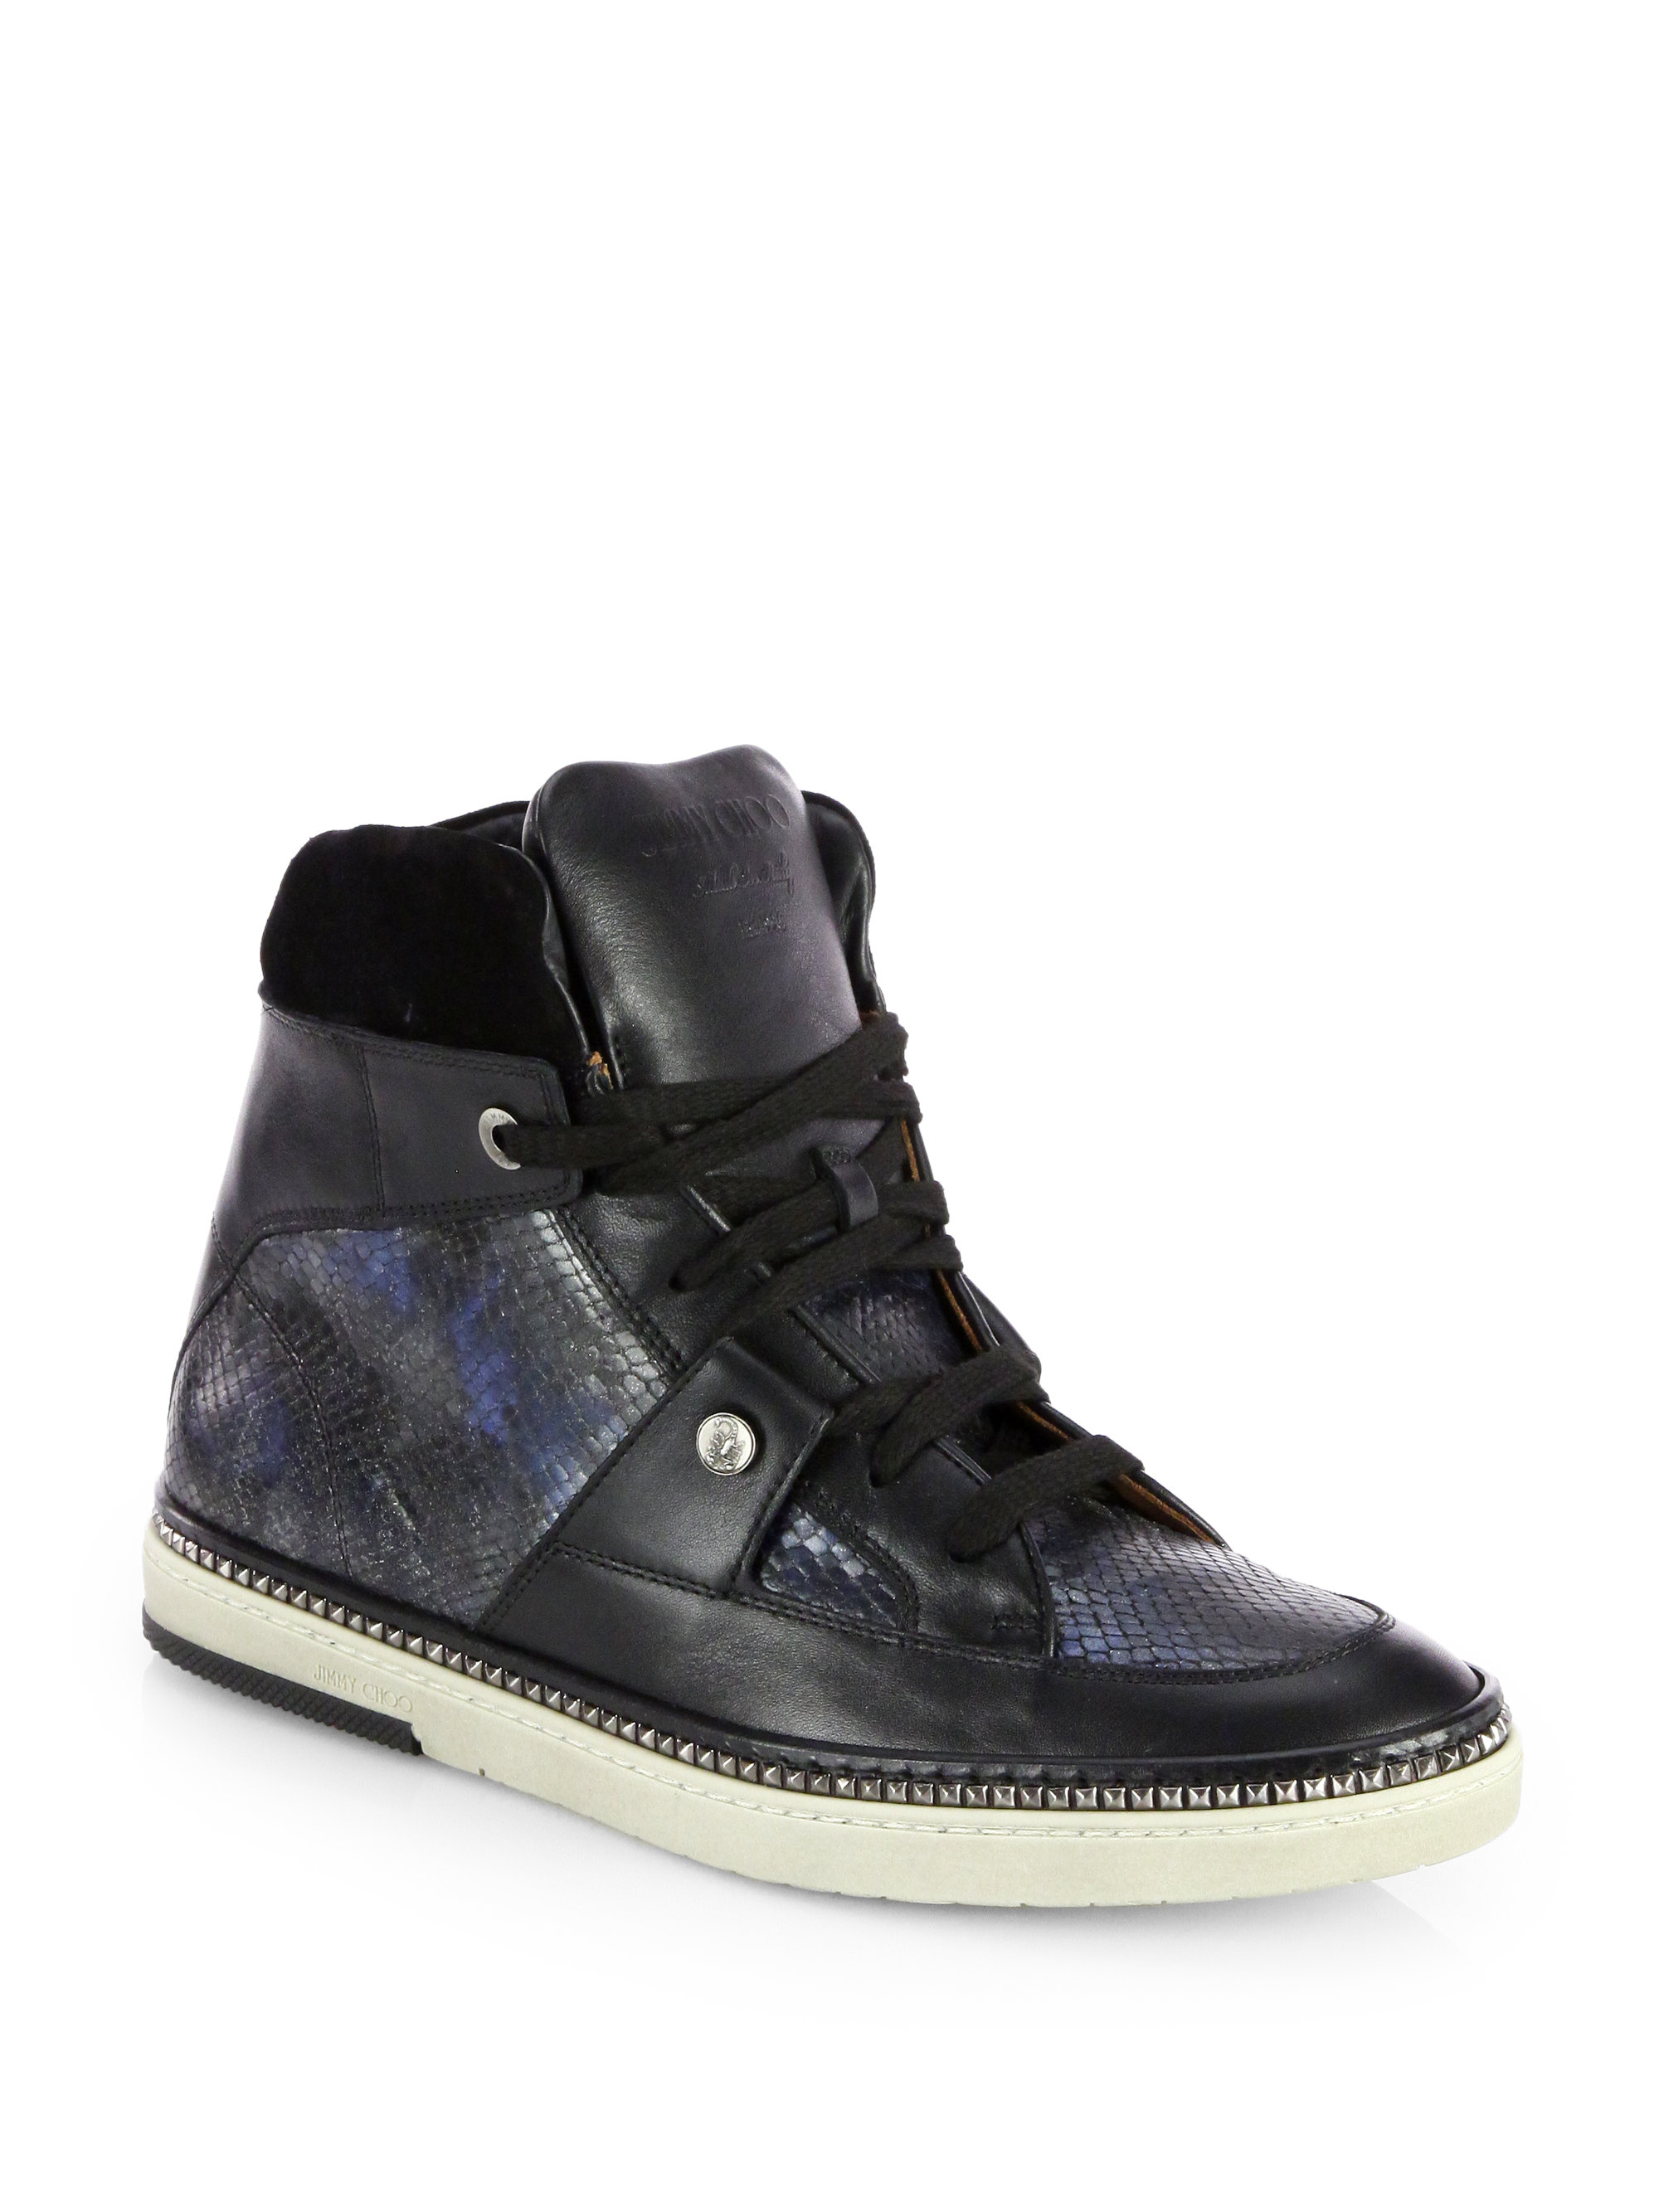 jimmy choo snakeembossed leather hightop sneakers in black for men lyst. Black Bedroom Furniture Sets. Home Design Ideas